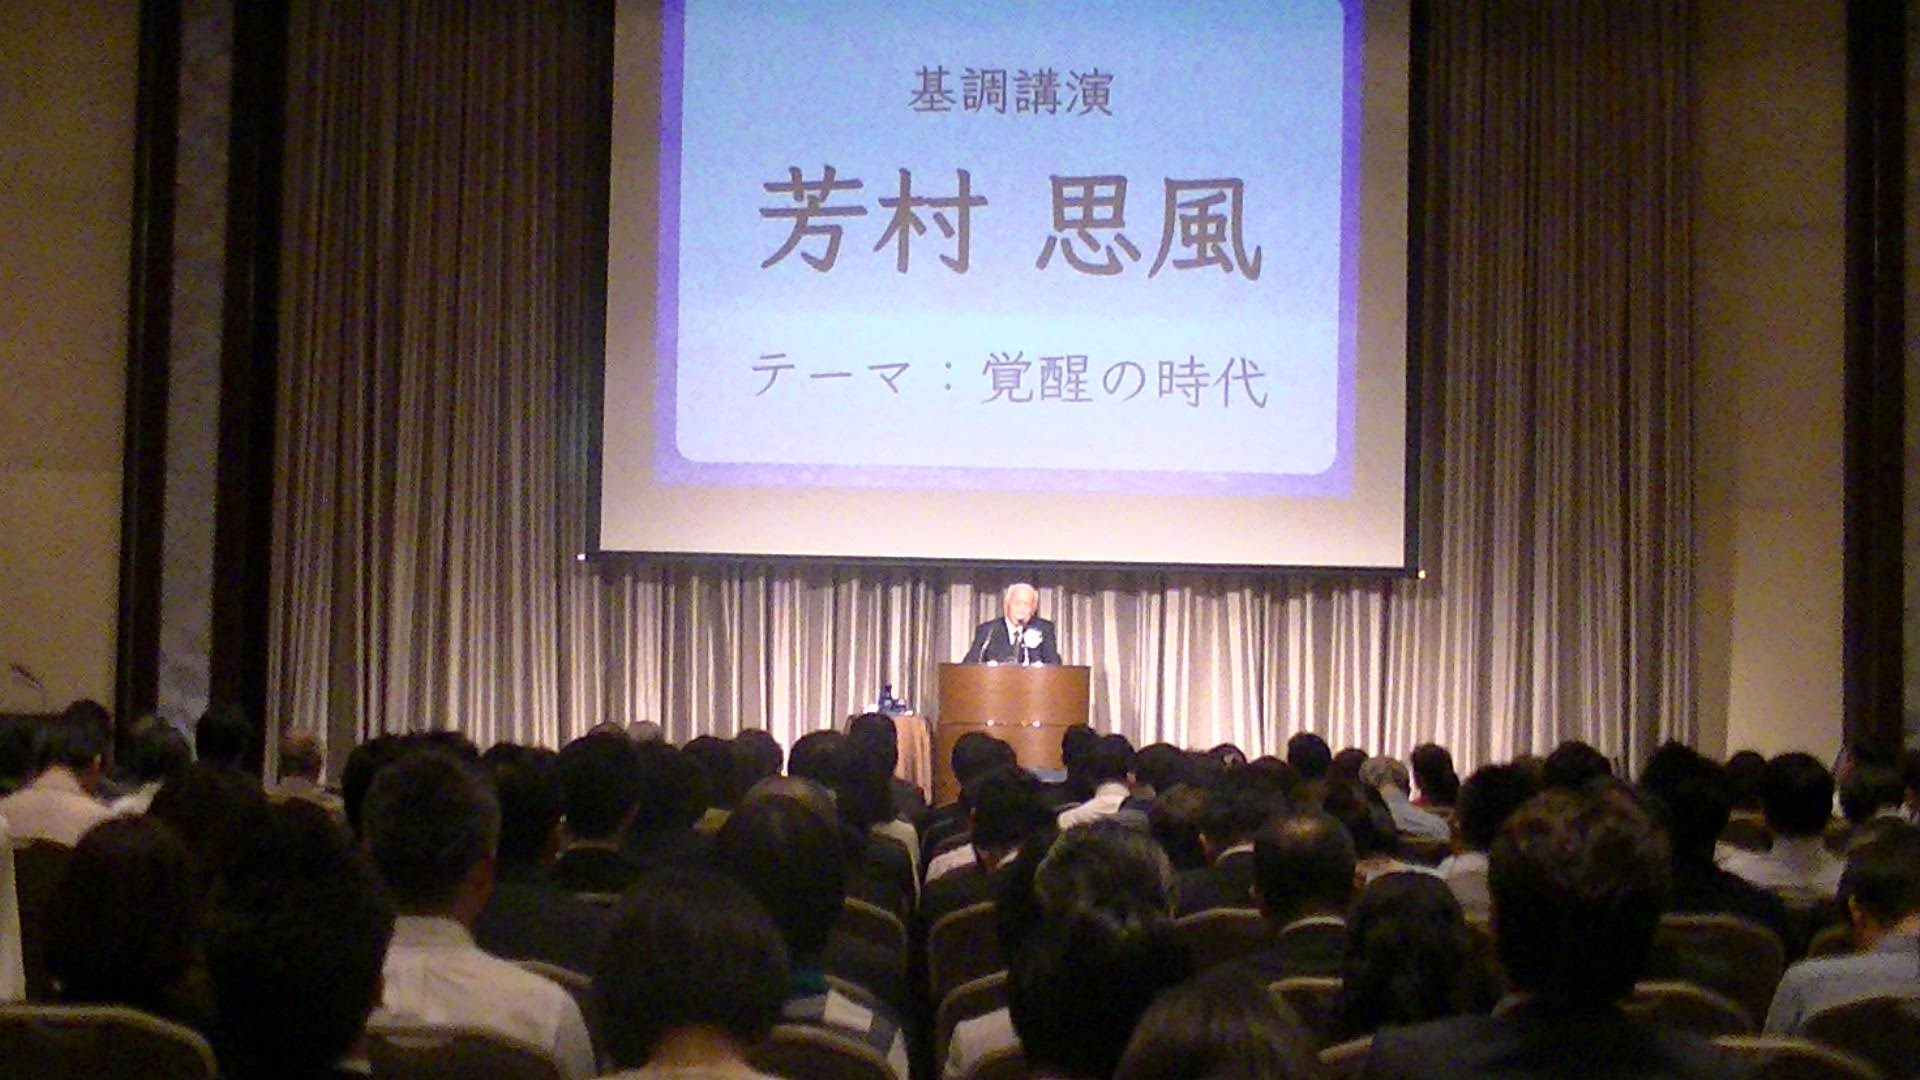 PIC 1682 1 - 思風会全国大会in広島